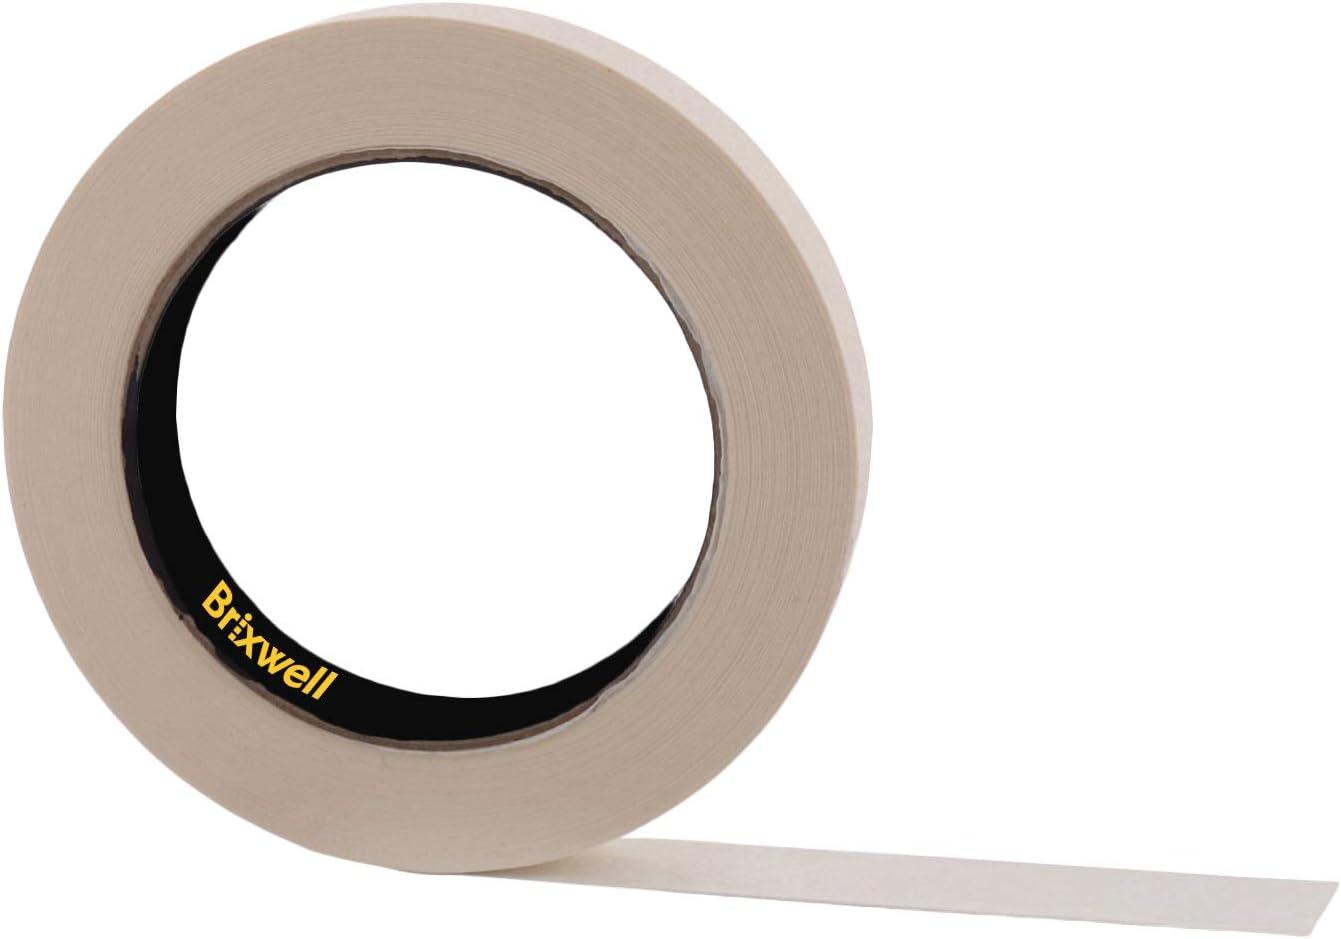 Brixwell Pro Grade Popular General Purpose Popular standard Masking Tan 6 Tape Inch x 3 4